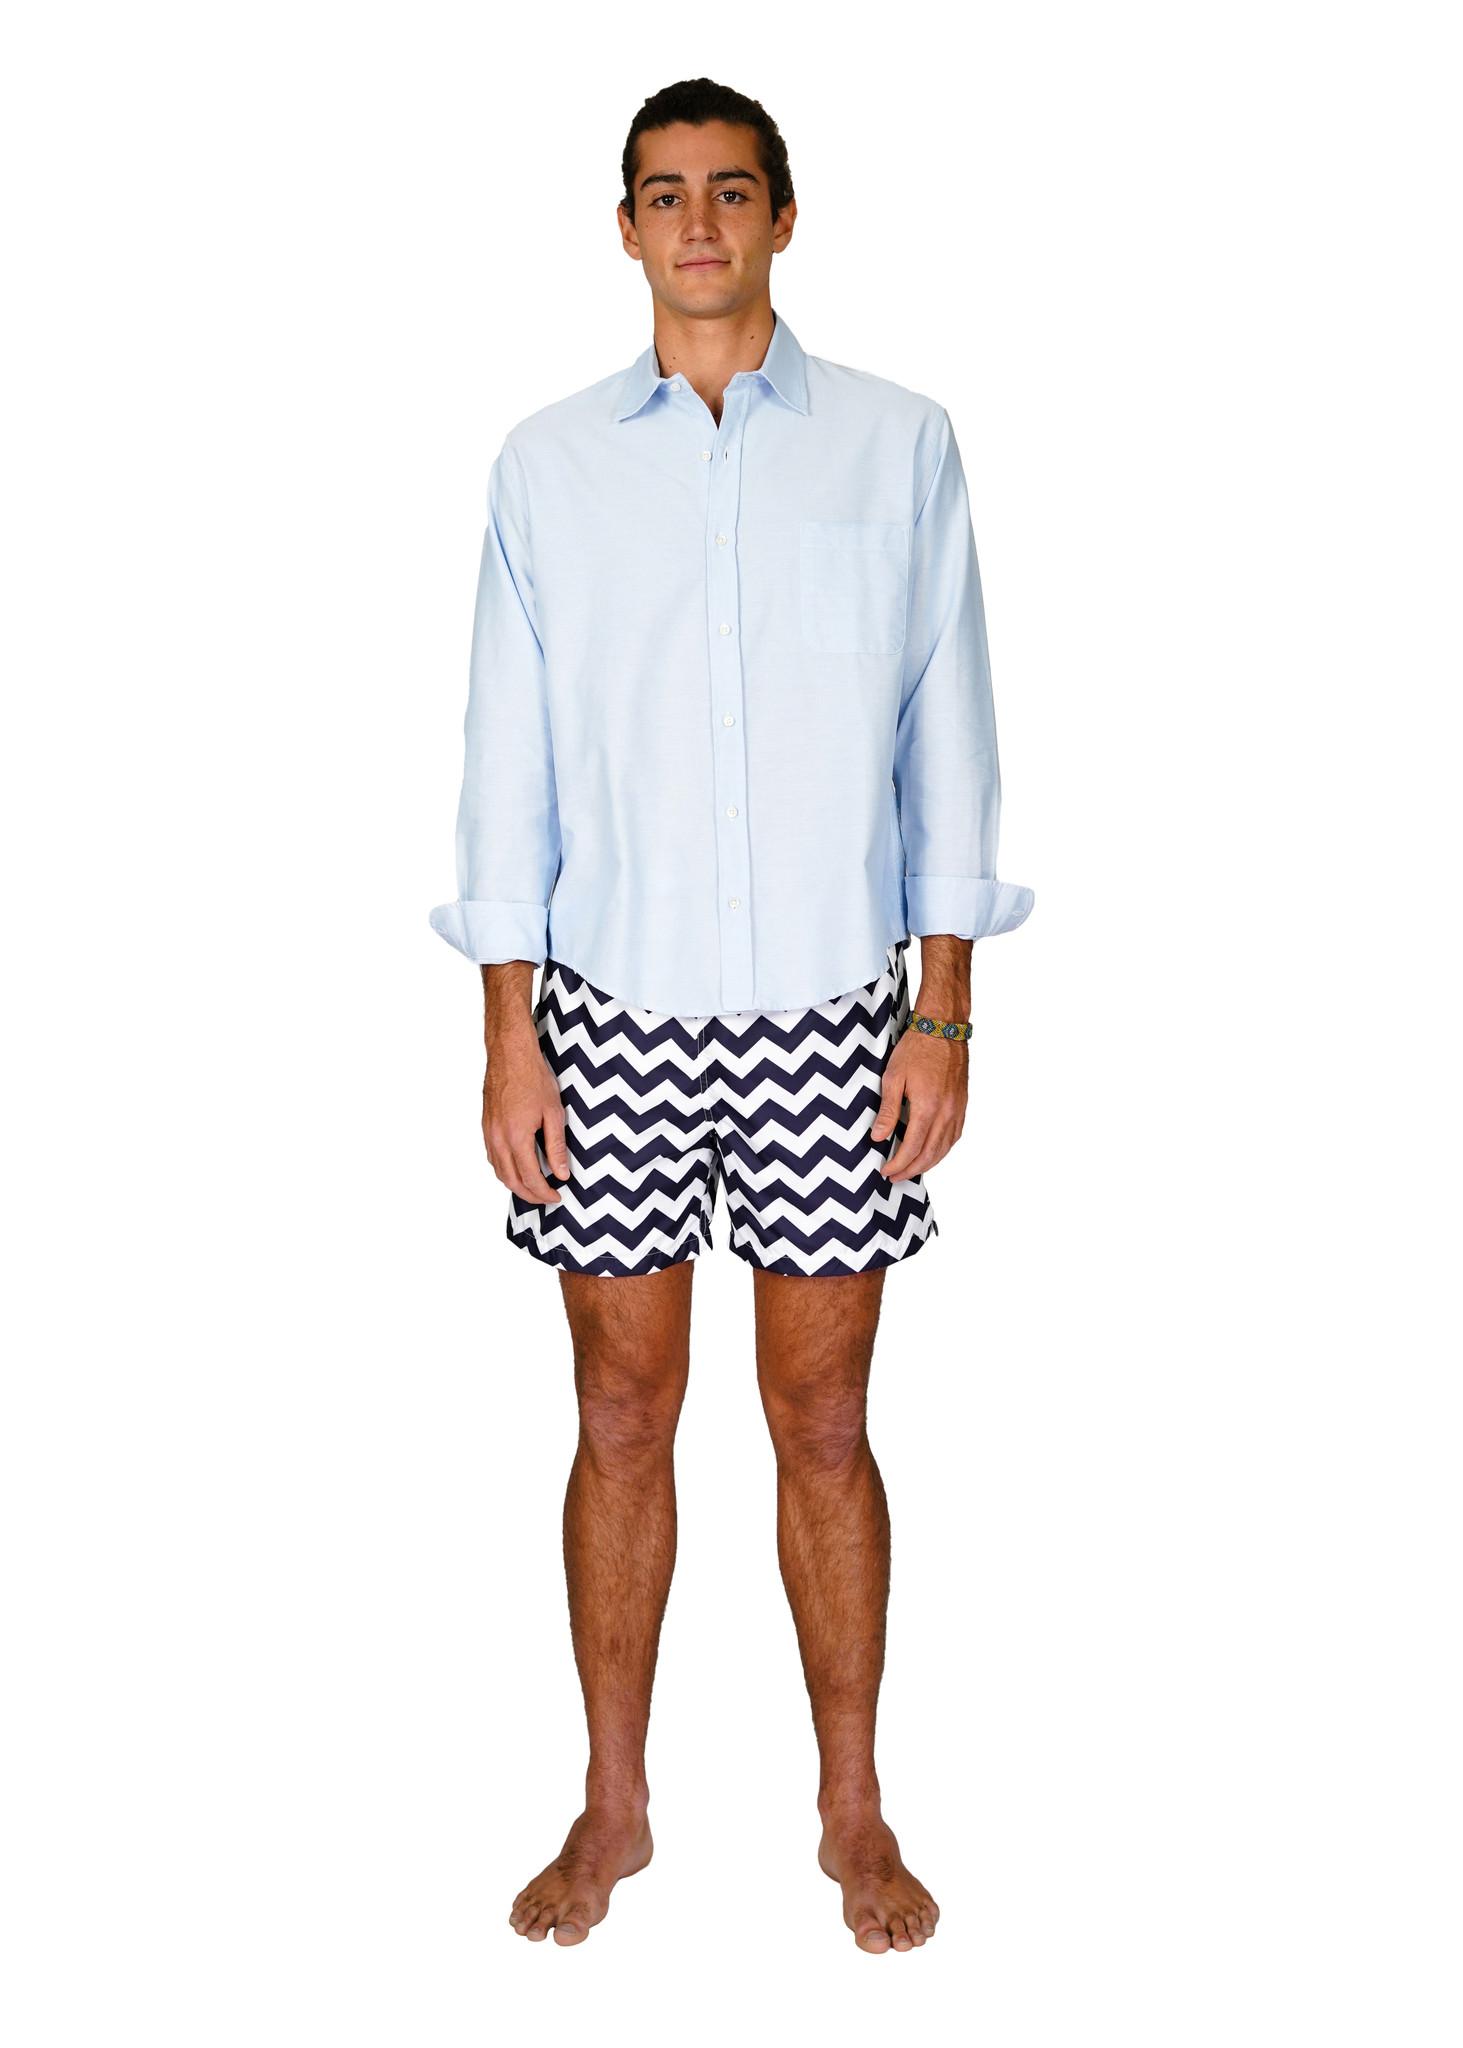 Men's beach shirt Lightblue-1